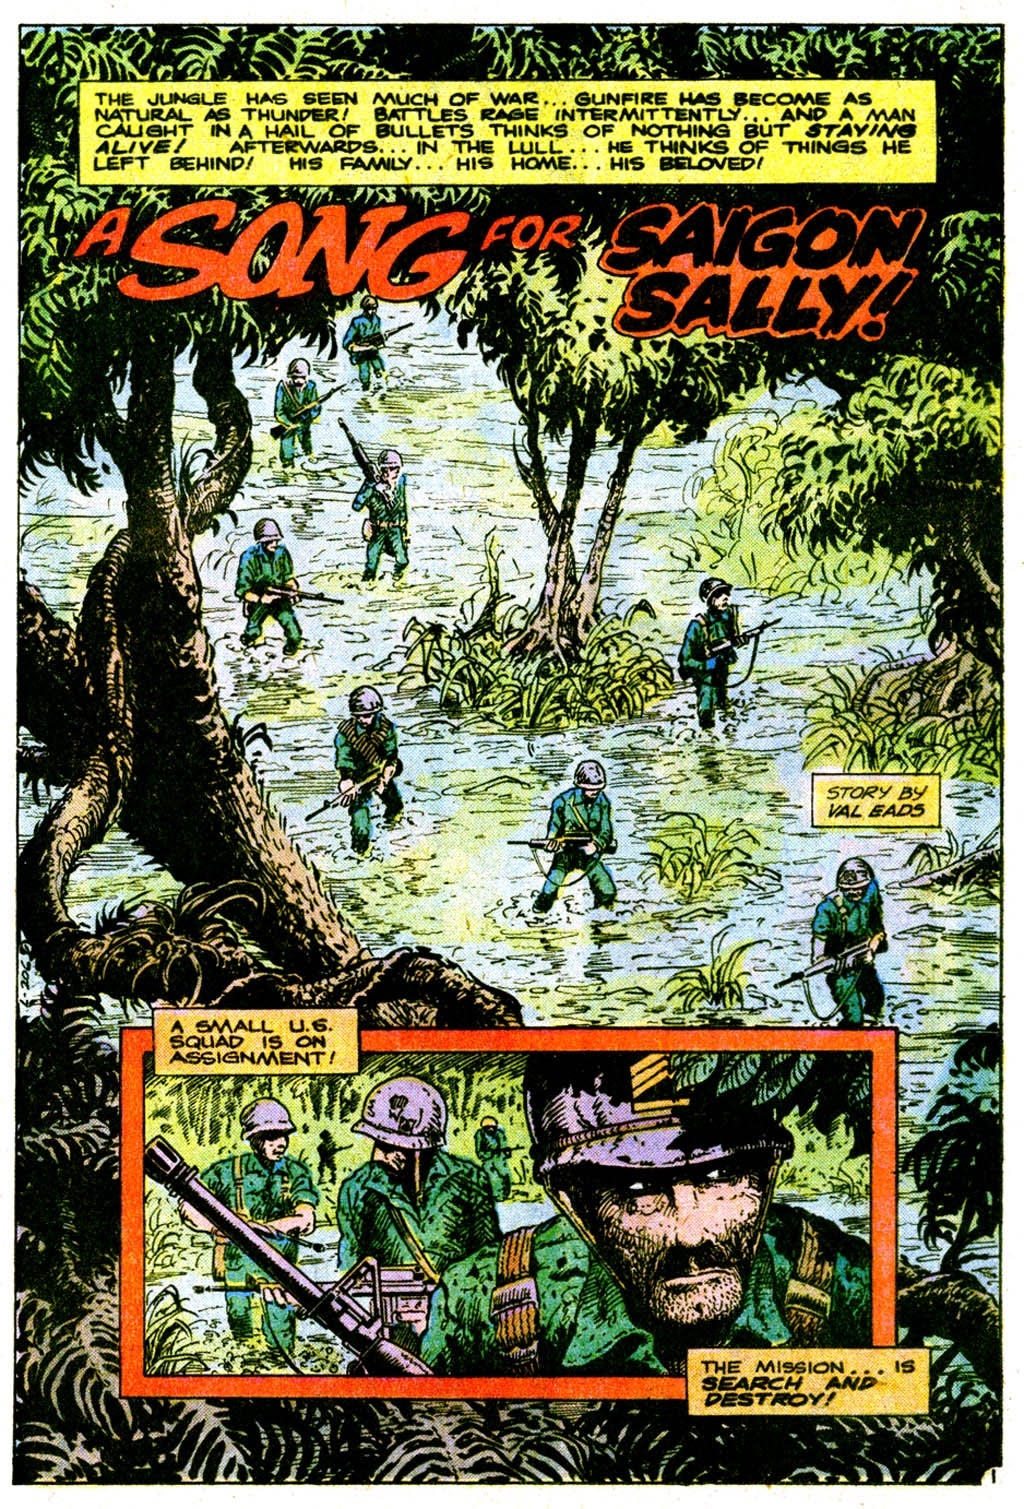 Read online Sgt. Rock comic -  Issue #311 - 24